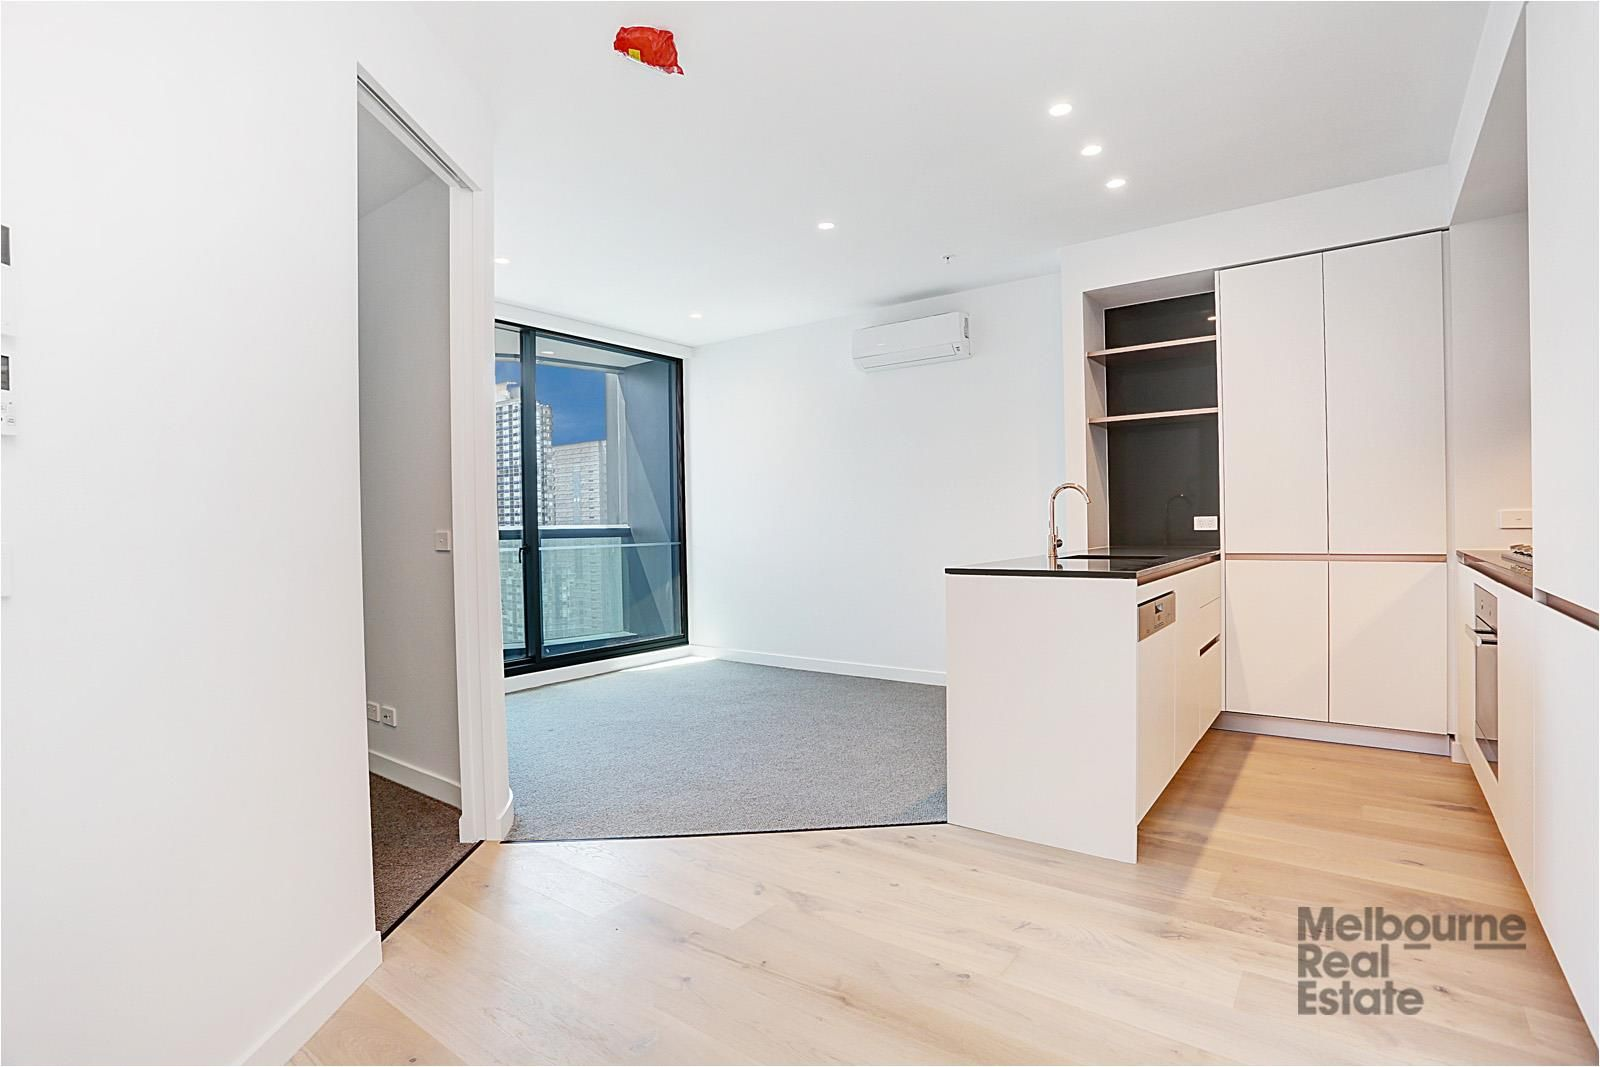 228 La Trobe Street, Melbourne VIC 3000, Image 0